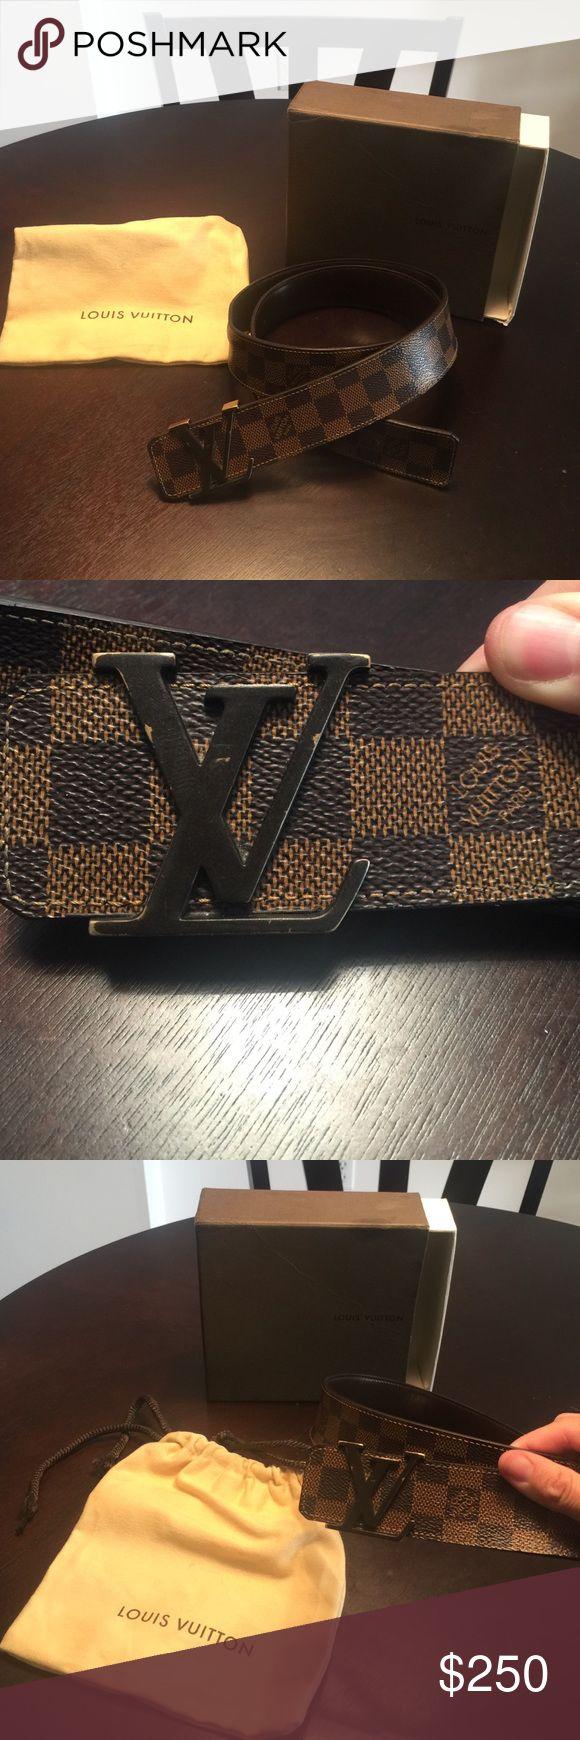 Louis Vuitton Belt Repair Cost | The